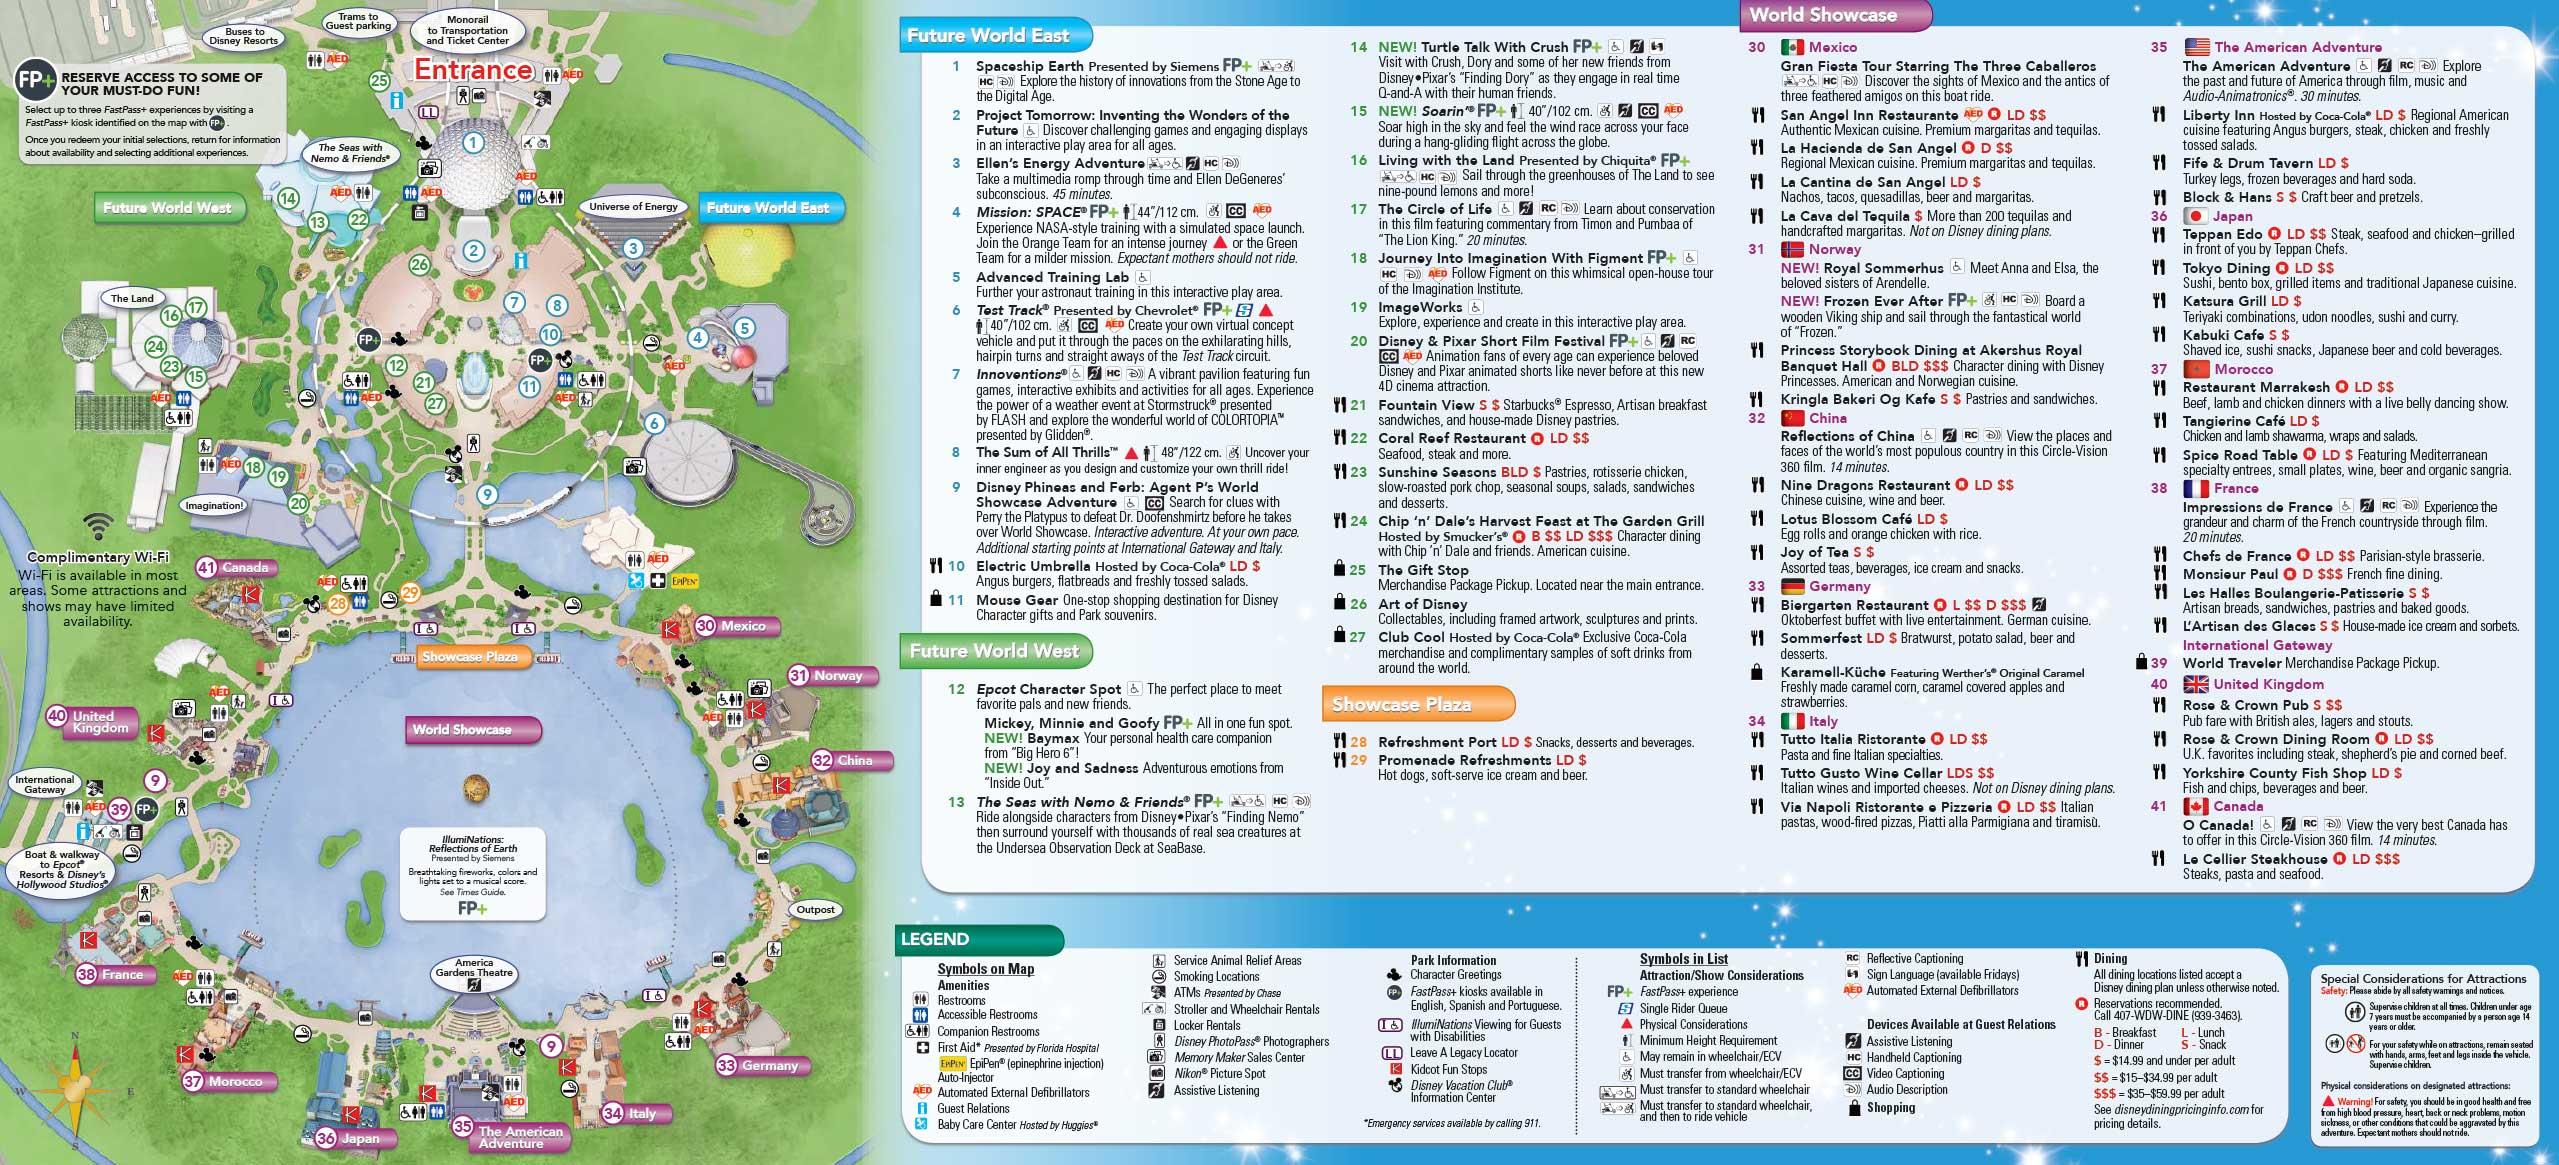 June 2016 Walt Disney World Park Maps - Photo 4 of 4